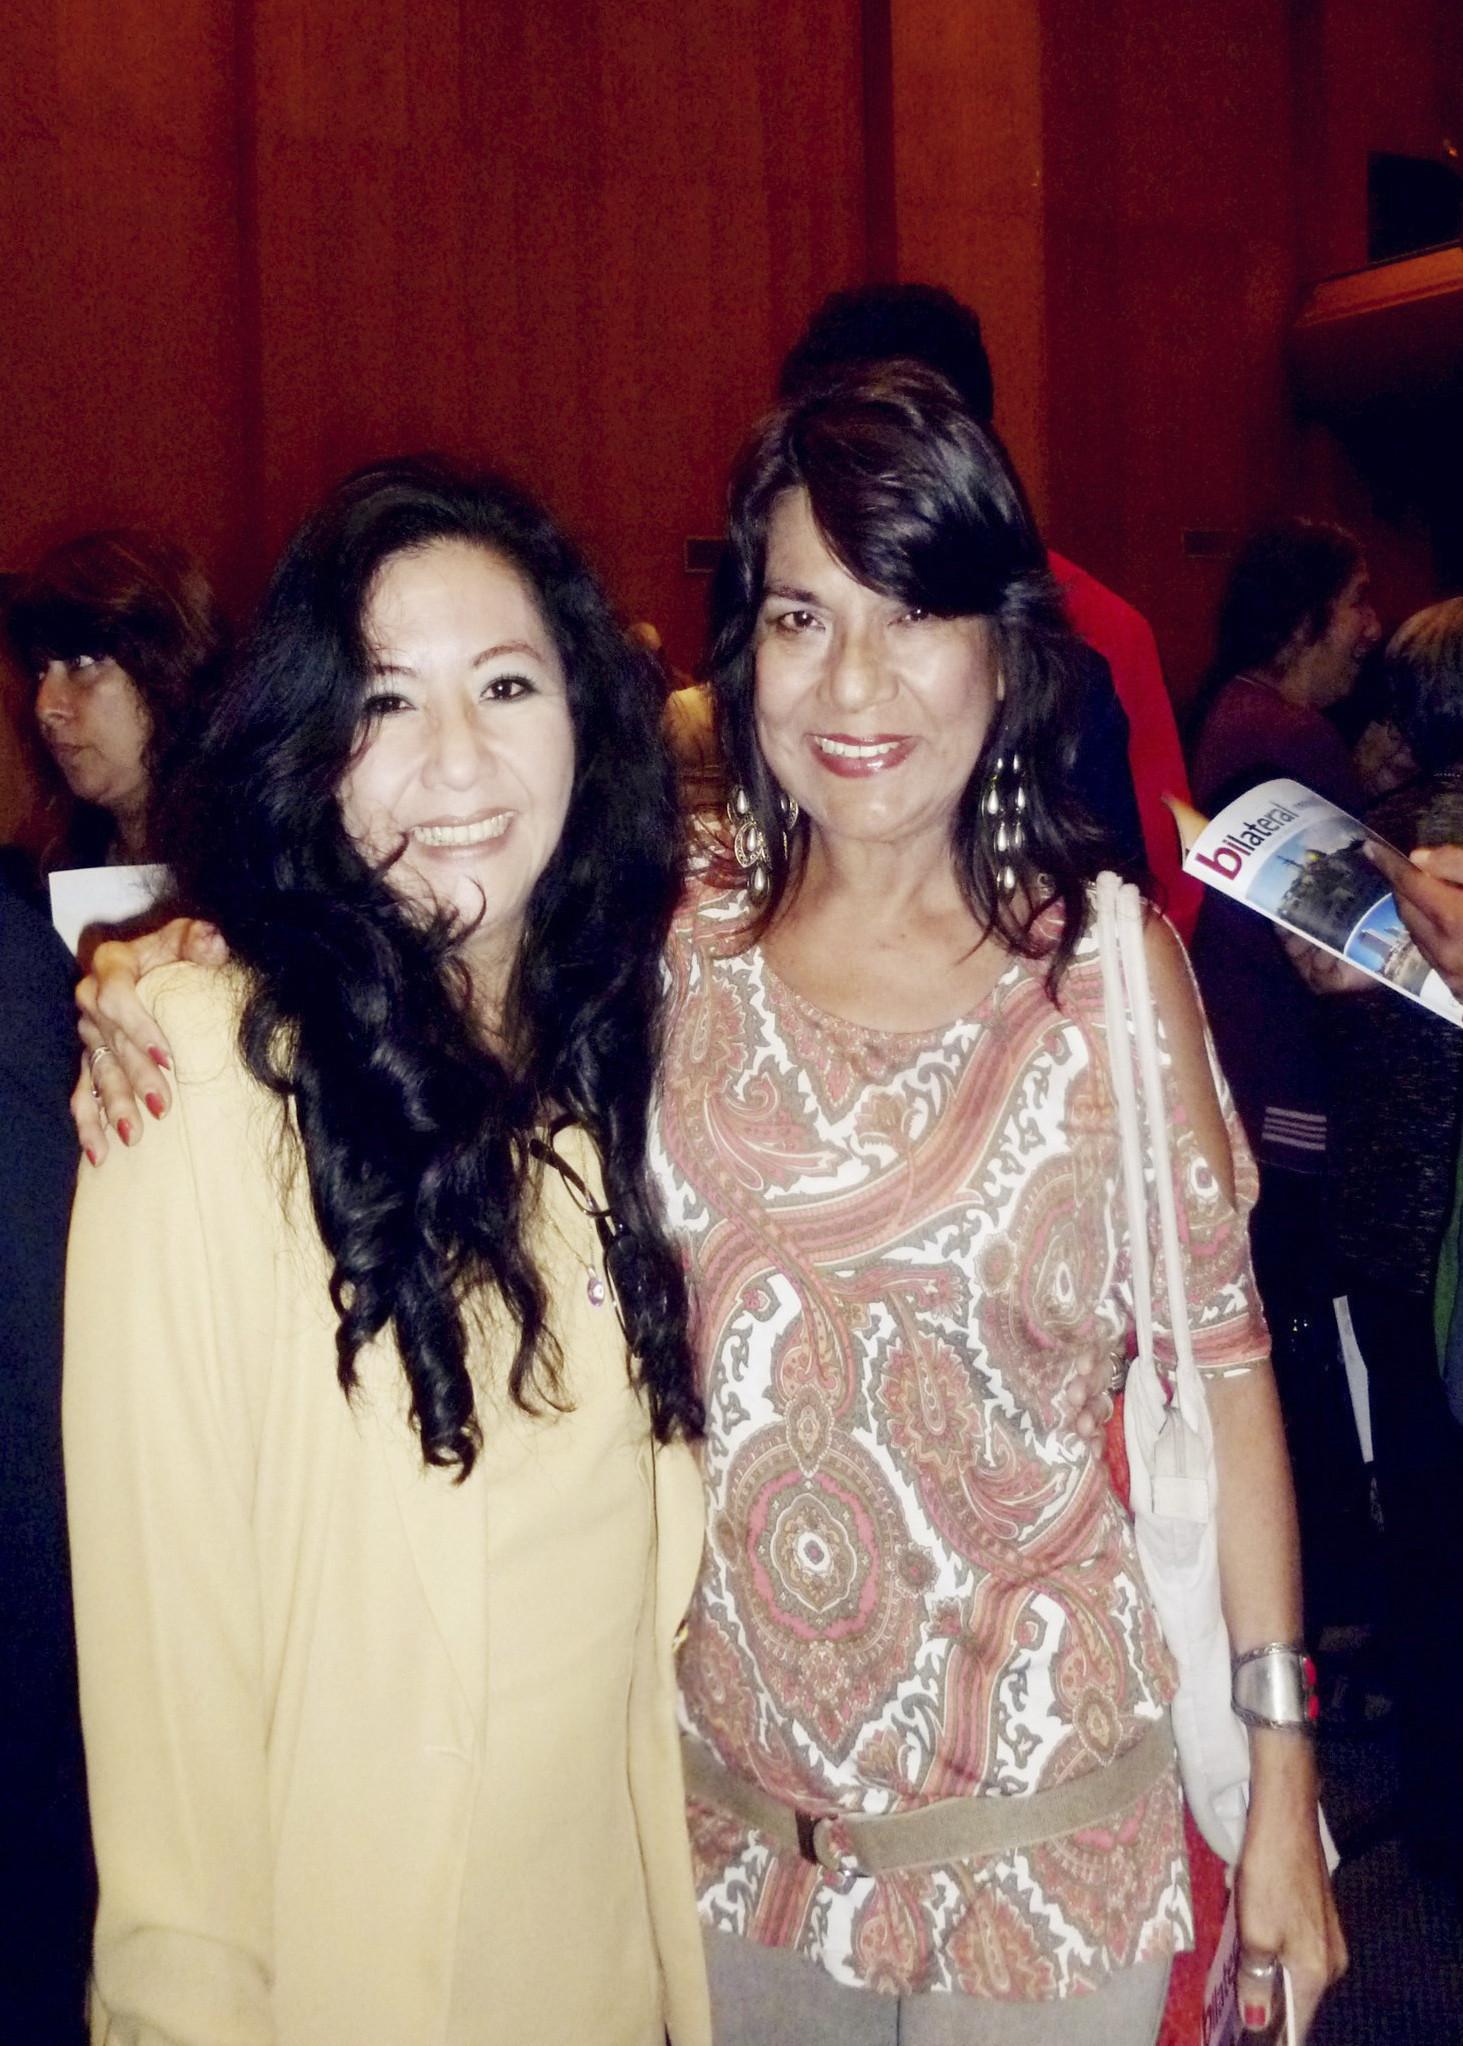 Fanny Jem Wong, Magister en Psicología, docente universitaria con Pilar Coca Santibáñez, artista plástica 30-04-2014 (1)